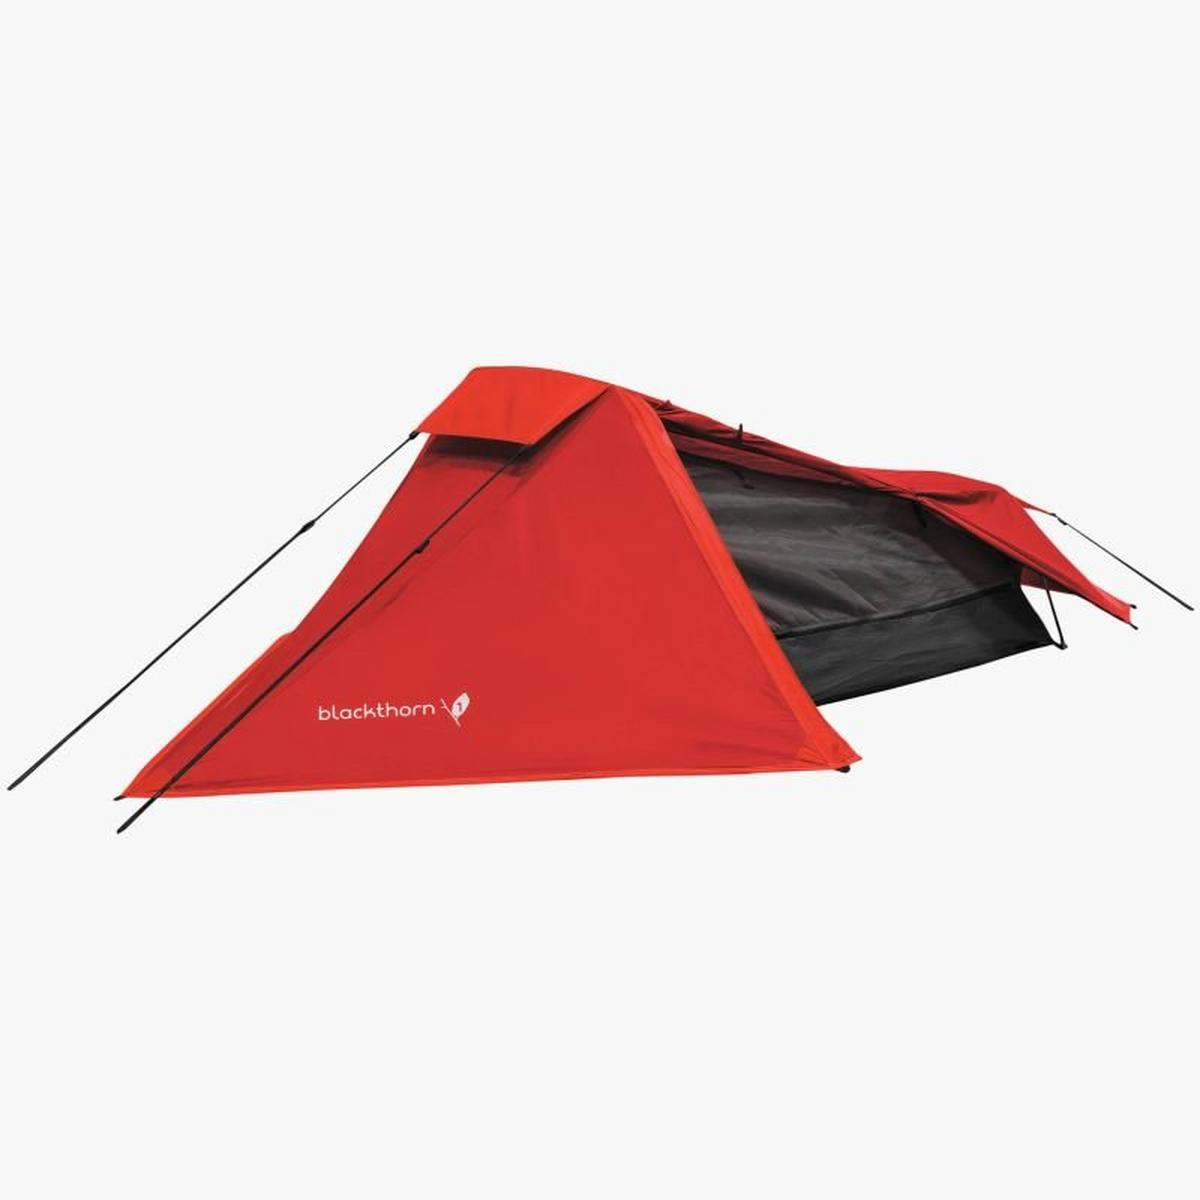 Highlander Blackthorn 1 - One Person Tent